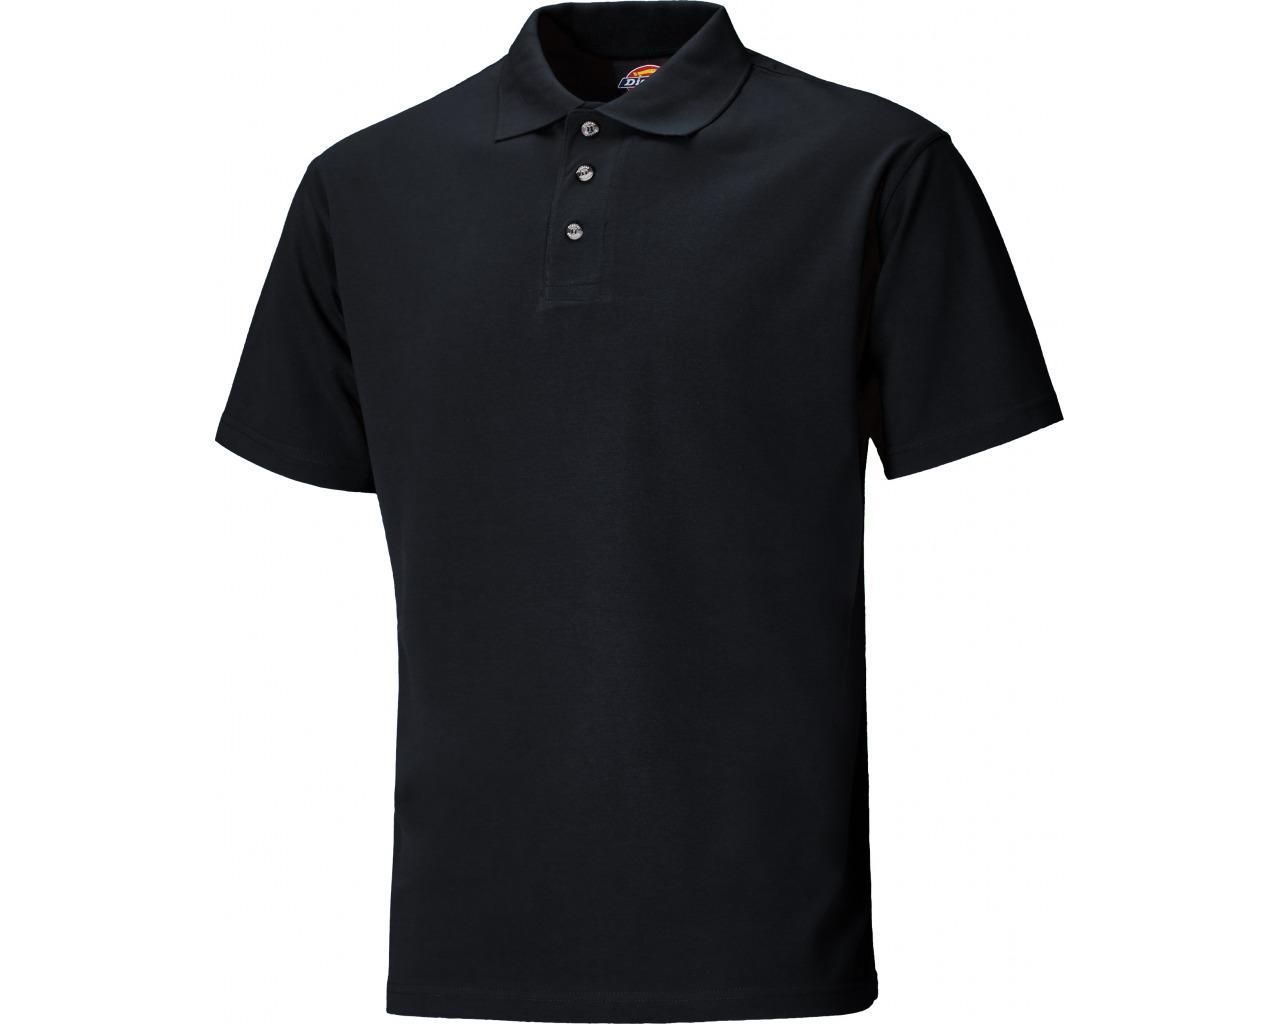 PERSIDENT STORE - Polo Shirt Pria S M L XL XXL Kaos Distro T-Shirt Fashion Pria Wanita / Polos Shirt Pria Polos Atasan Pakaian Polos Pendek Kerah Berkerah Lacos Pique Lacost Formal Casual Korean